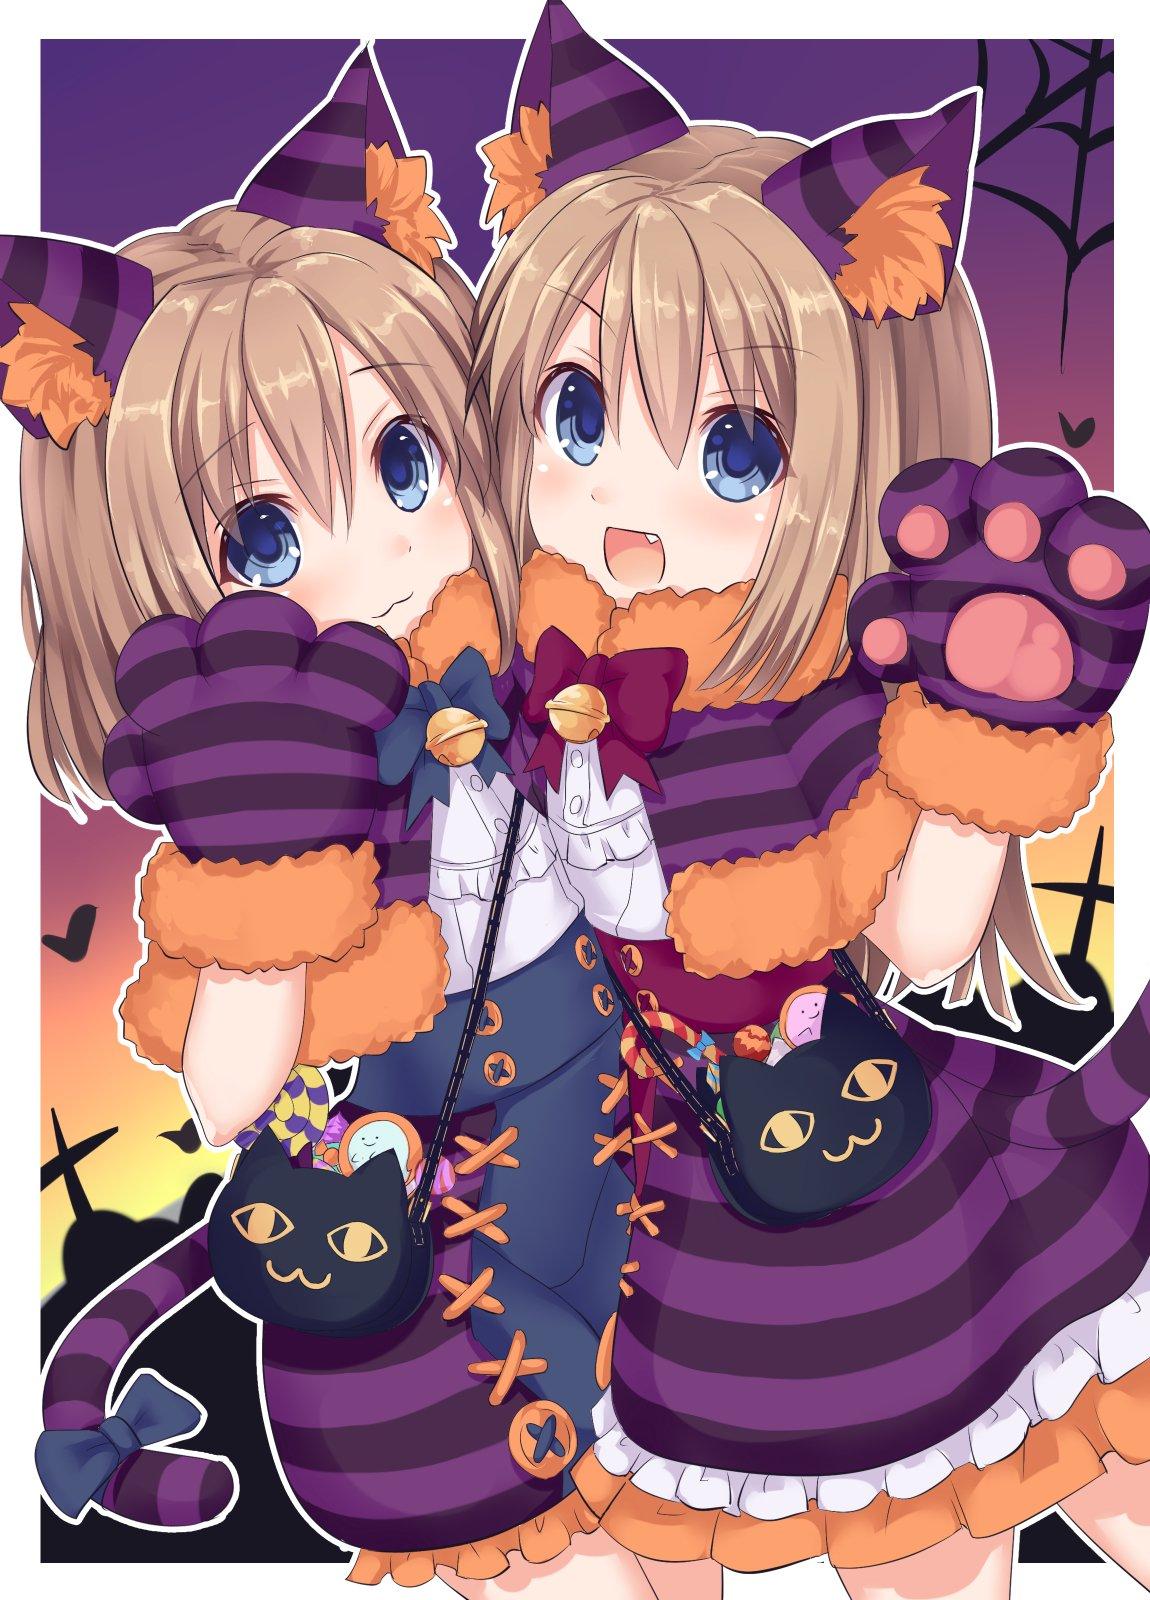 2girls animal_ears black_cat blue_eyes brown_hair candy cat cat_ears cat_paws fang food halloween halloween_costume highres kazuneko_(wktk1024) multiple_girls neptune_(series) paws purple_skirt ram_(neptune_series) rom_(neptune_series) siblings skirt striped twins